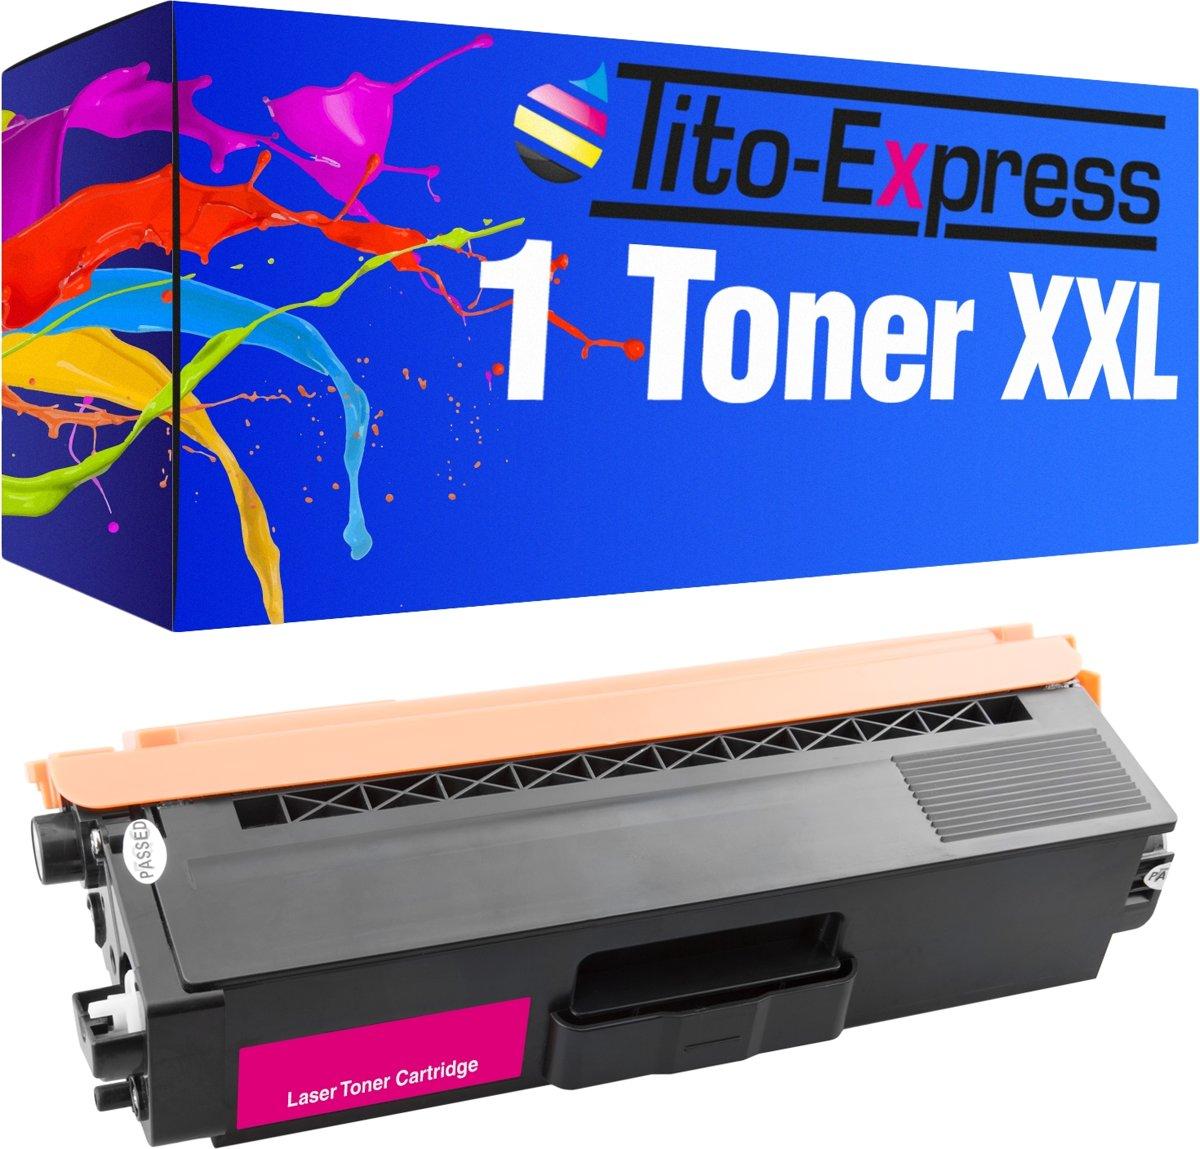 Tito-Express PlatinumSerie PlatinumSerie® 1 XXL tonercartridge voor brother TN-325 magenta Brother DCP-9055 CDN / DCP-9270 CDN / HL-4100 Series / HL-4140 CN / HL-4150 CDN / HL-4500 Series / HL-4570 CDW / HL-4570 CDWT / MFC-9460 CDN / MFC-9465 CDN / kopen